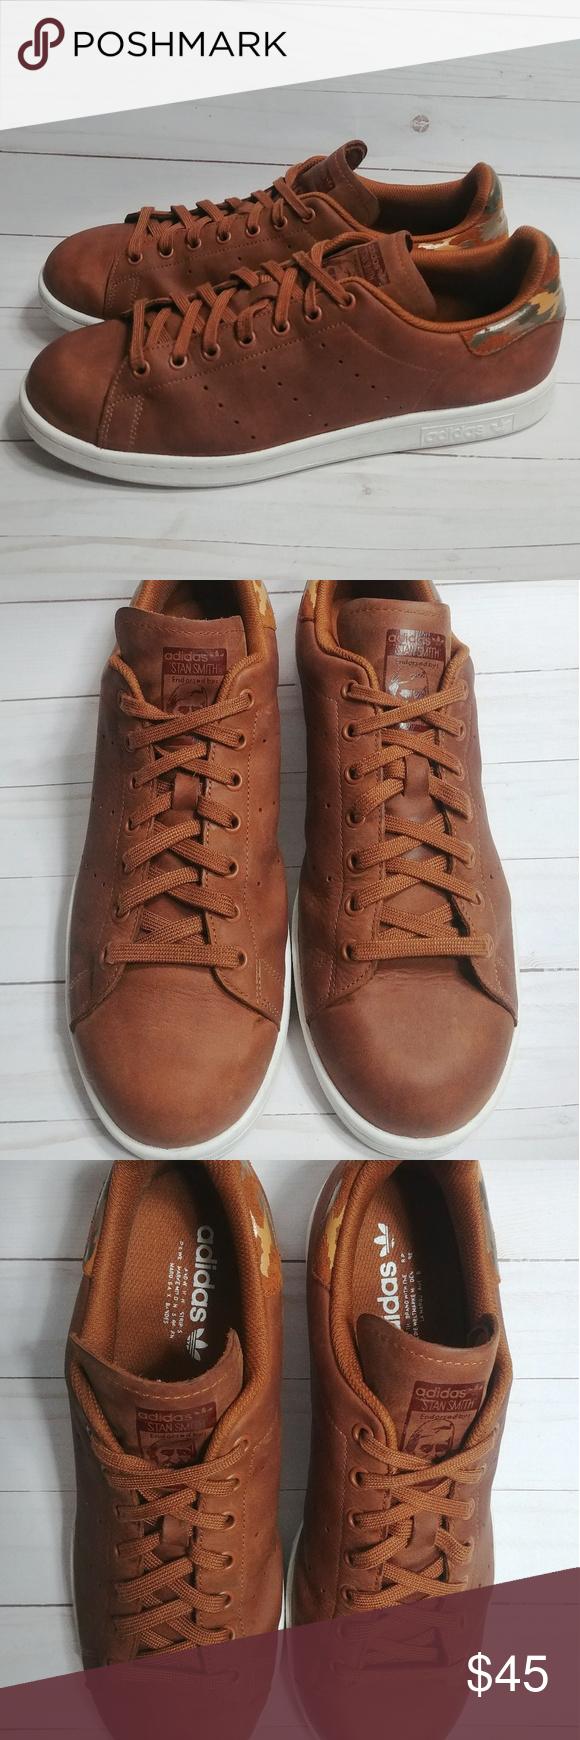 papi Madurar fiesta  Adidas Original Leather Stan Smith Camo Adidas Stan Smith Shoes Mens size  12 Genuine Leather Upp…   Adidas shoes stan smith, Stan smith shoes, Shoes  sneakers adidas